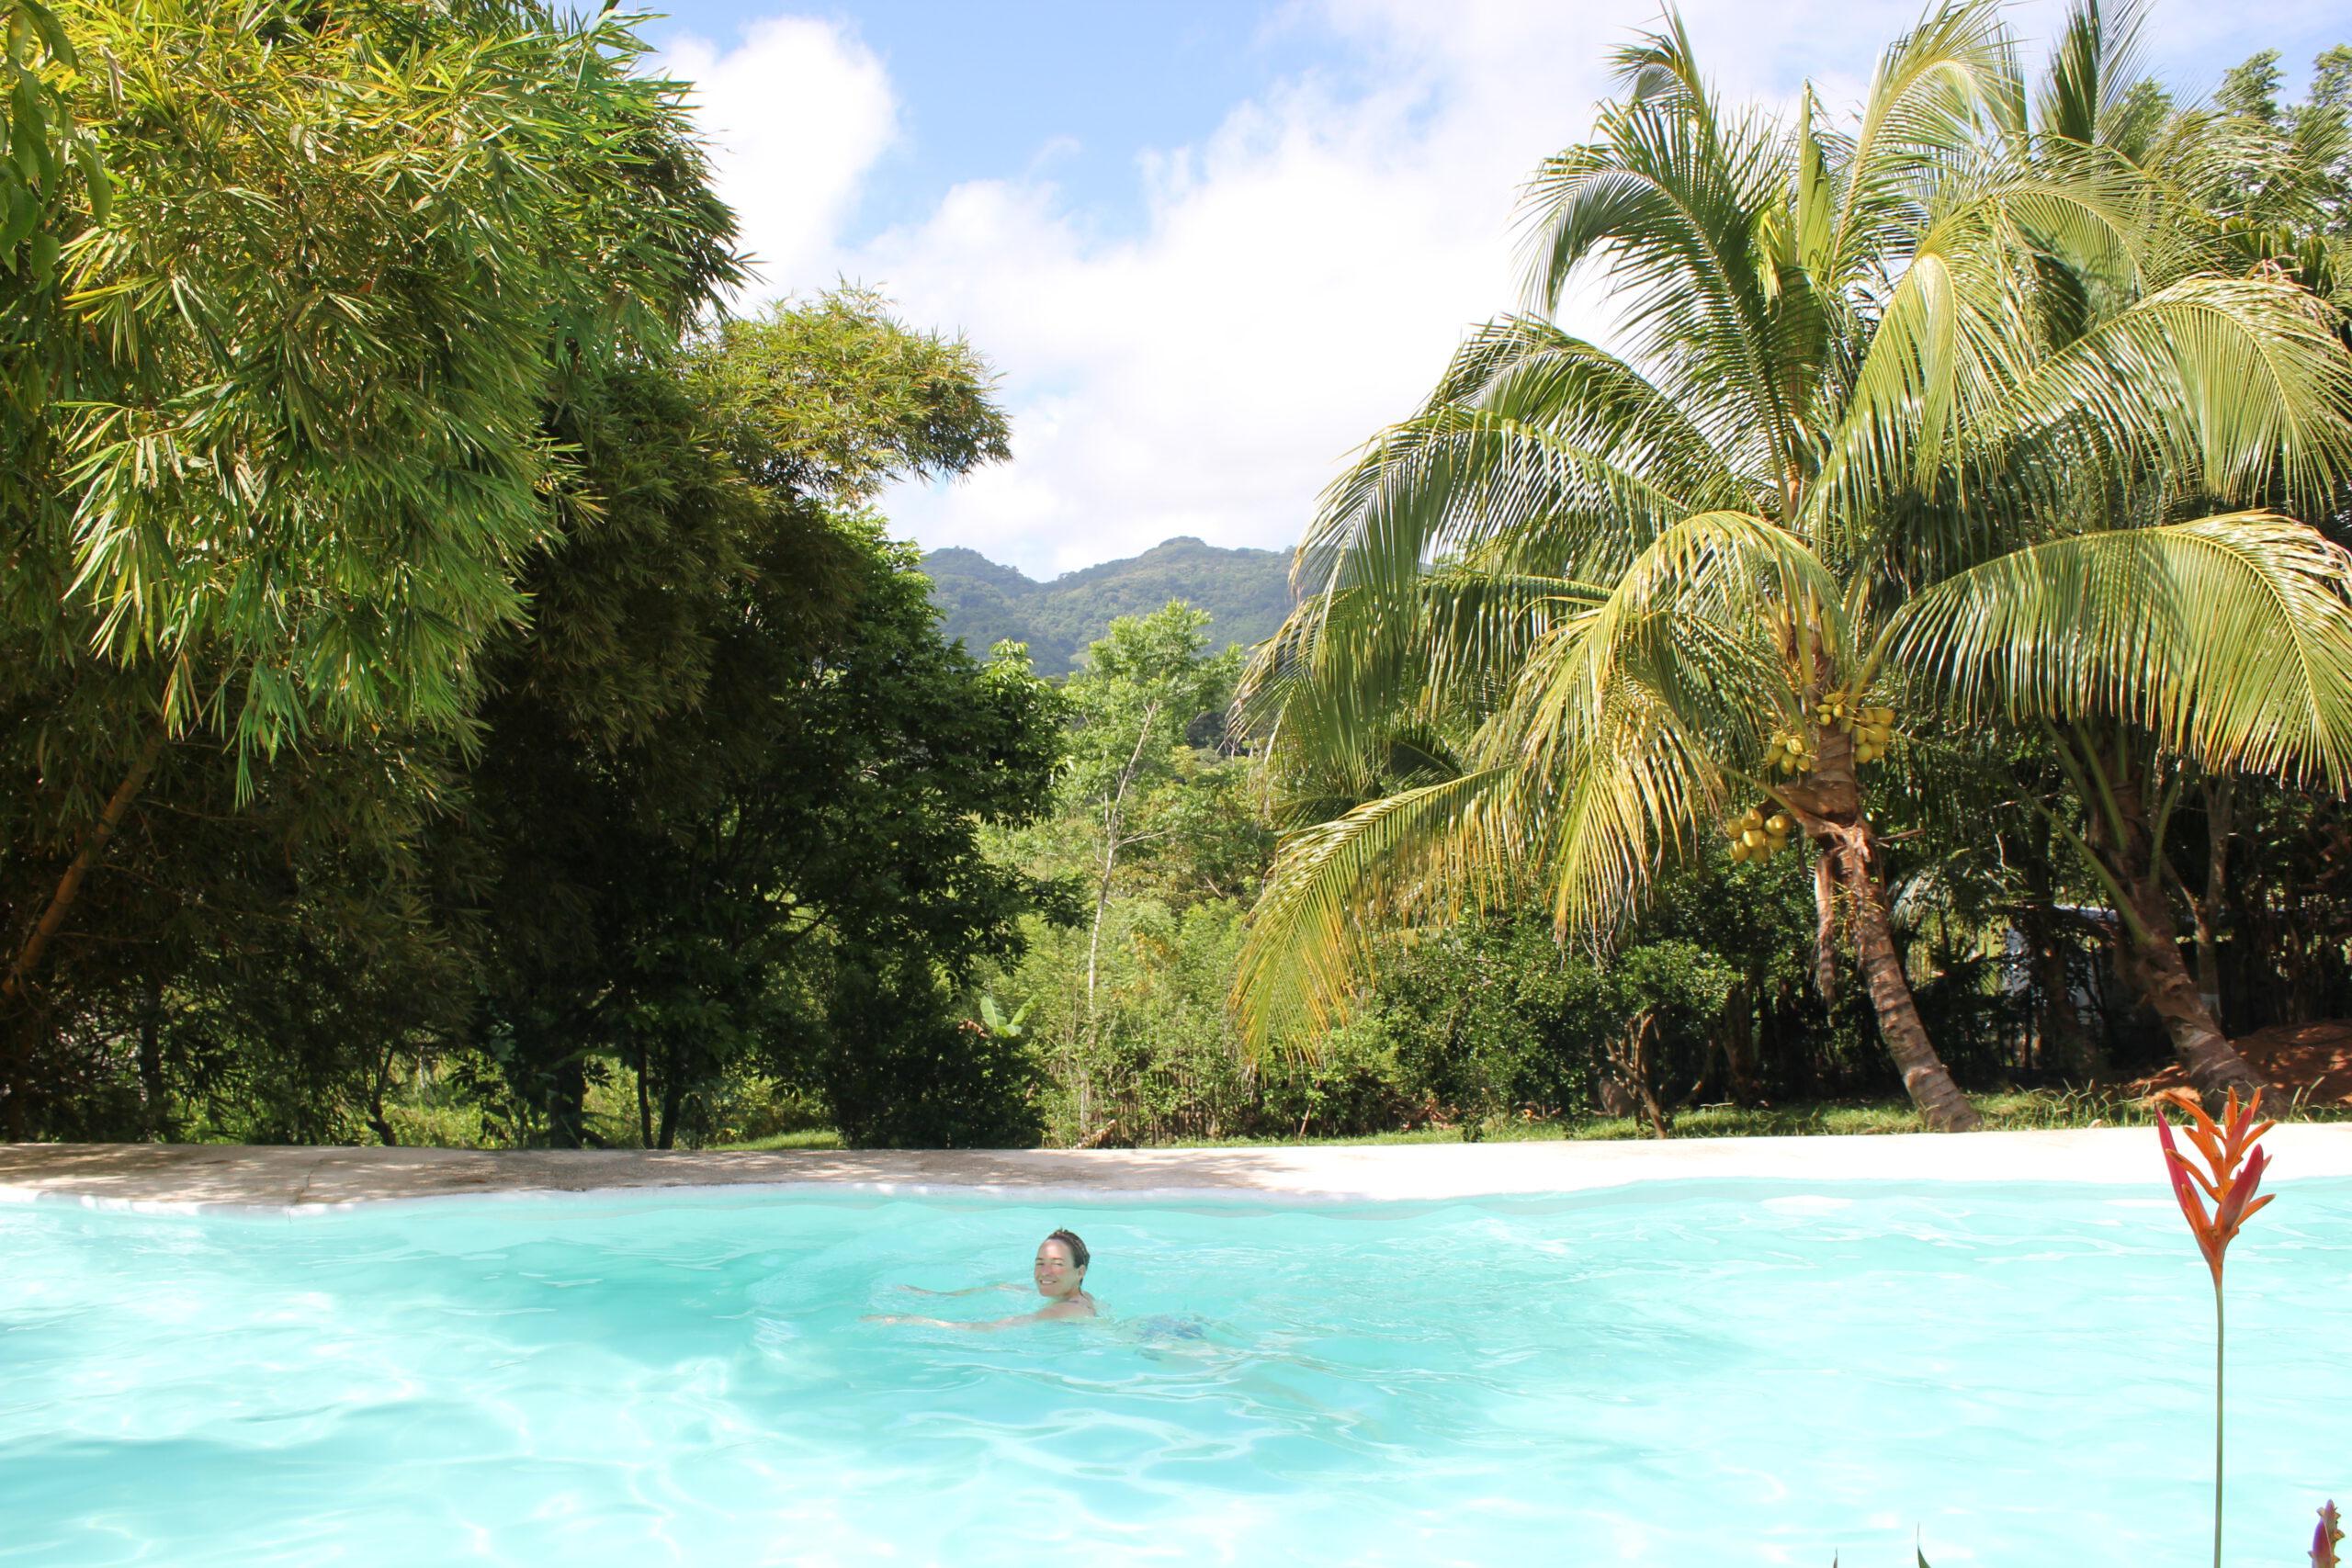 Krijg je Airbnb-servicekosten terug in 5 simpele stappen - Reisgelukjes